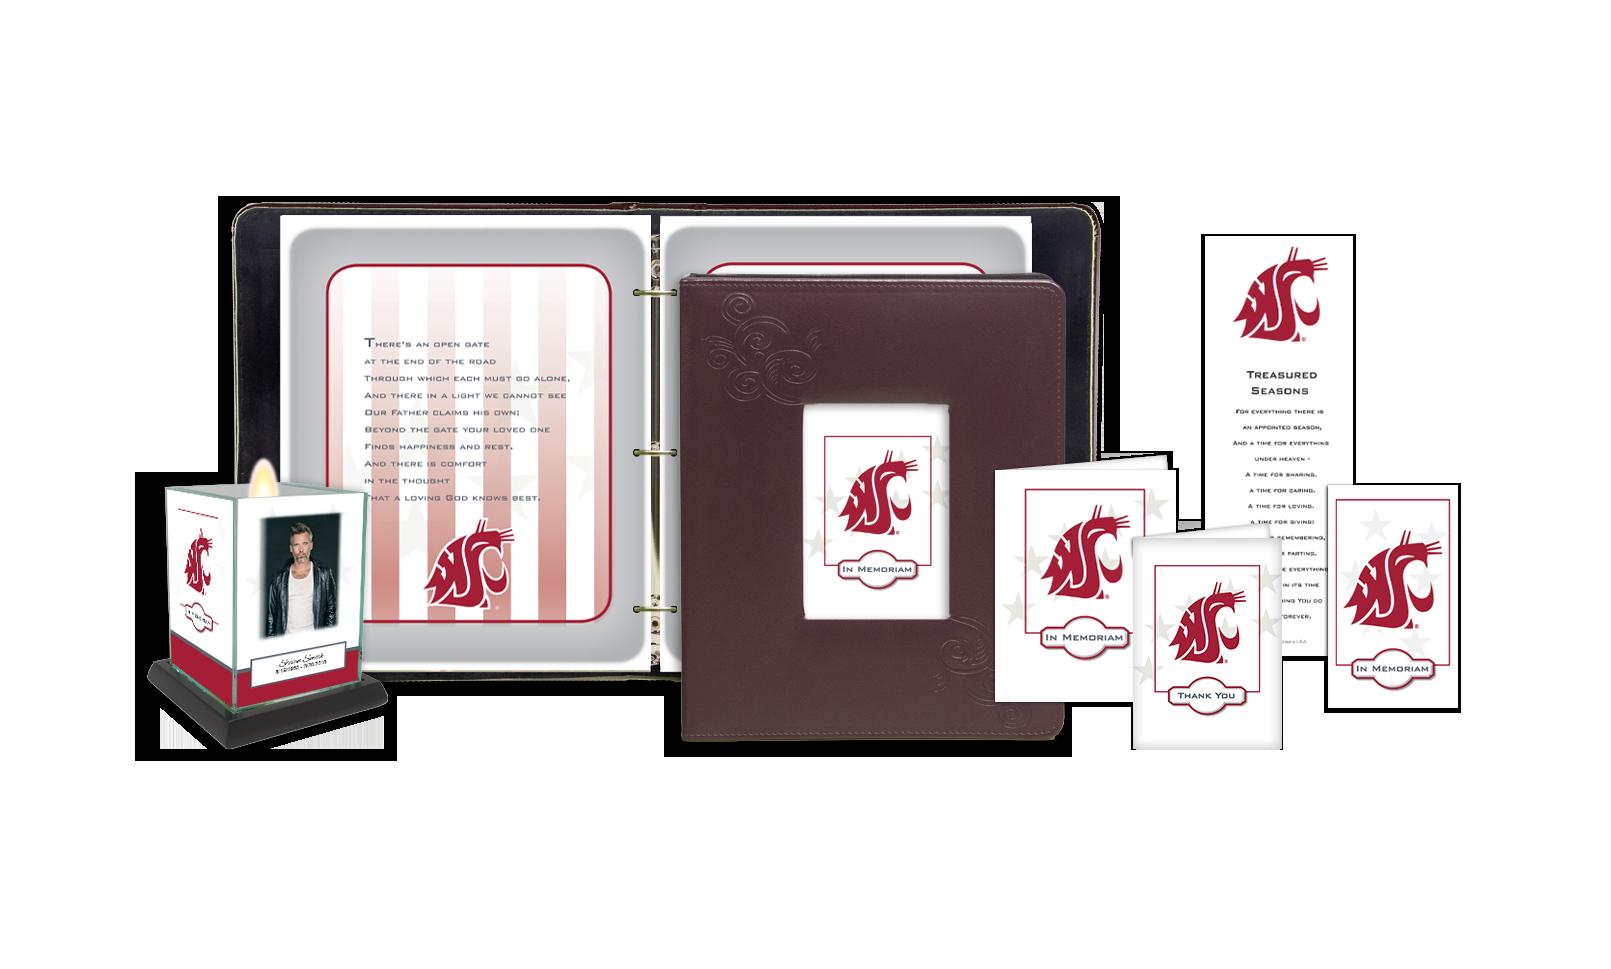 Washington State University Series